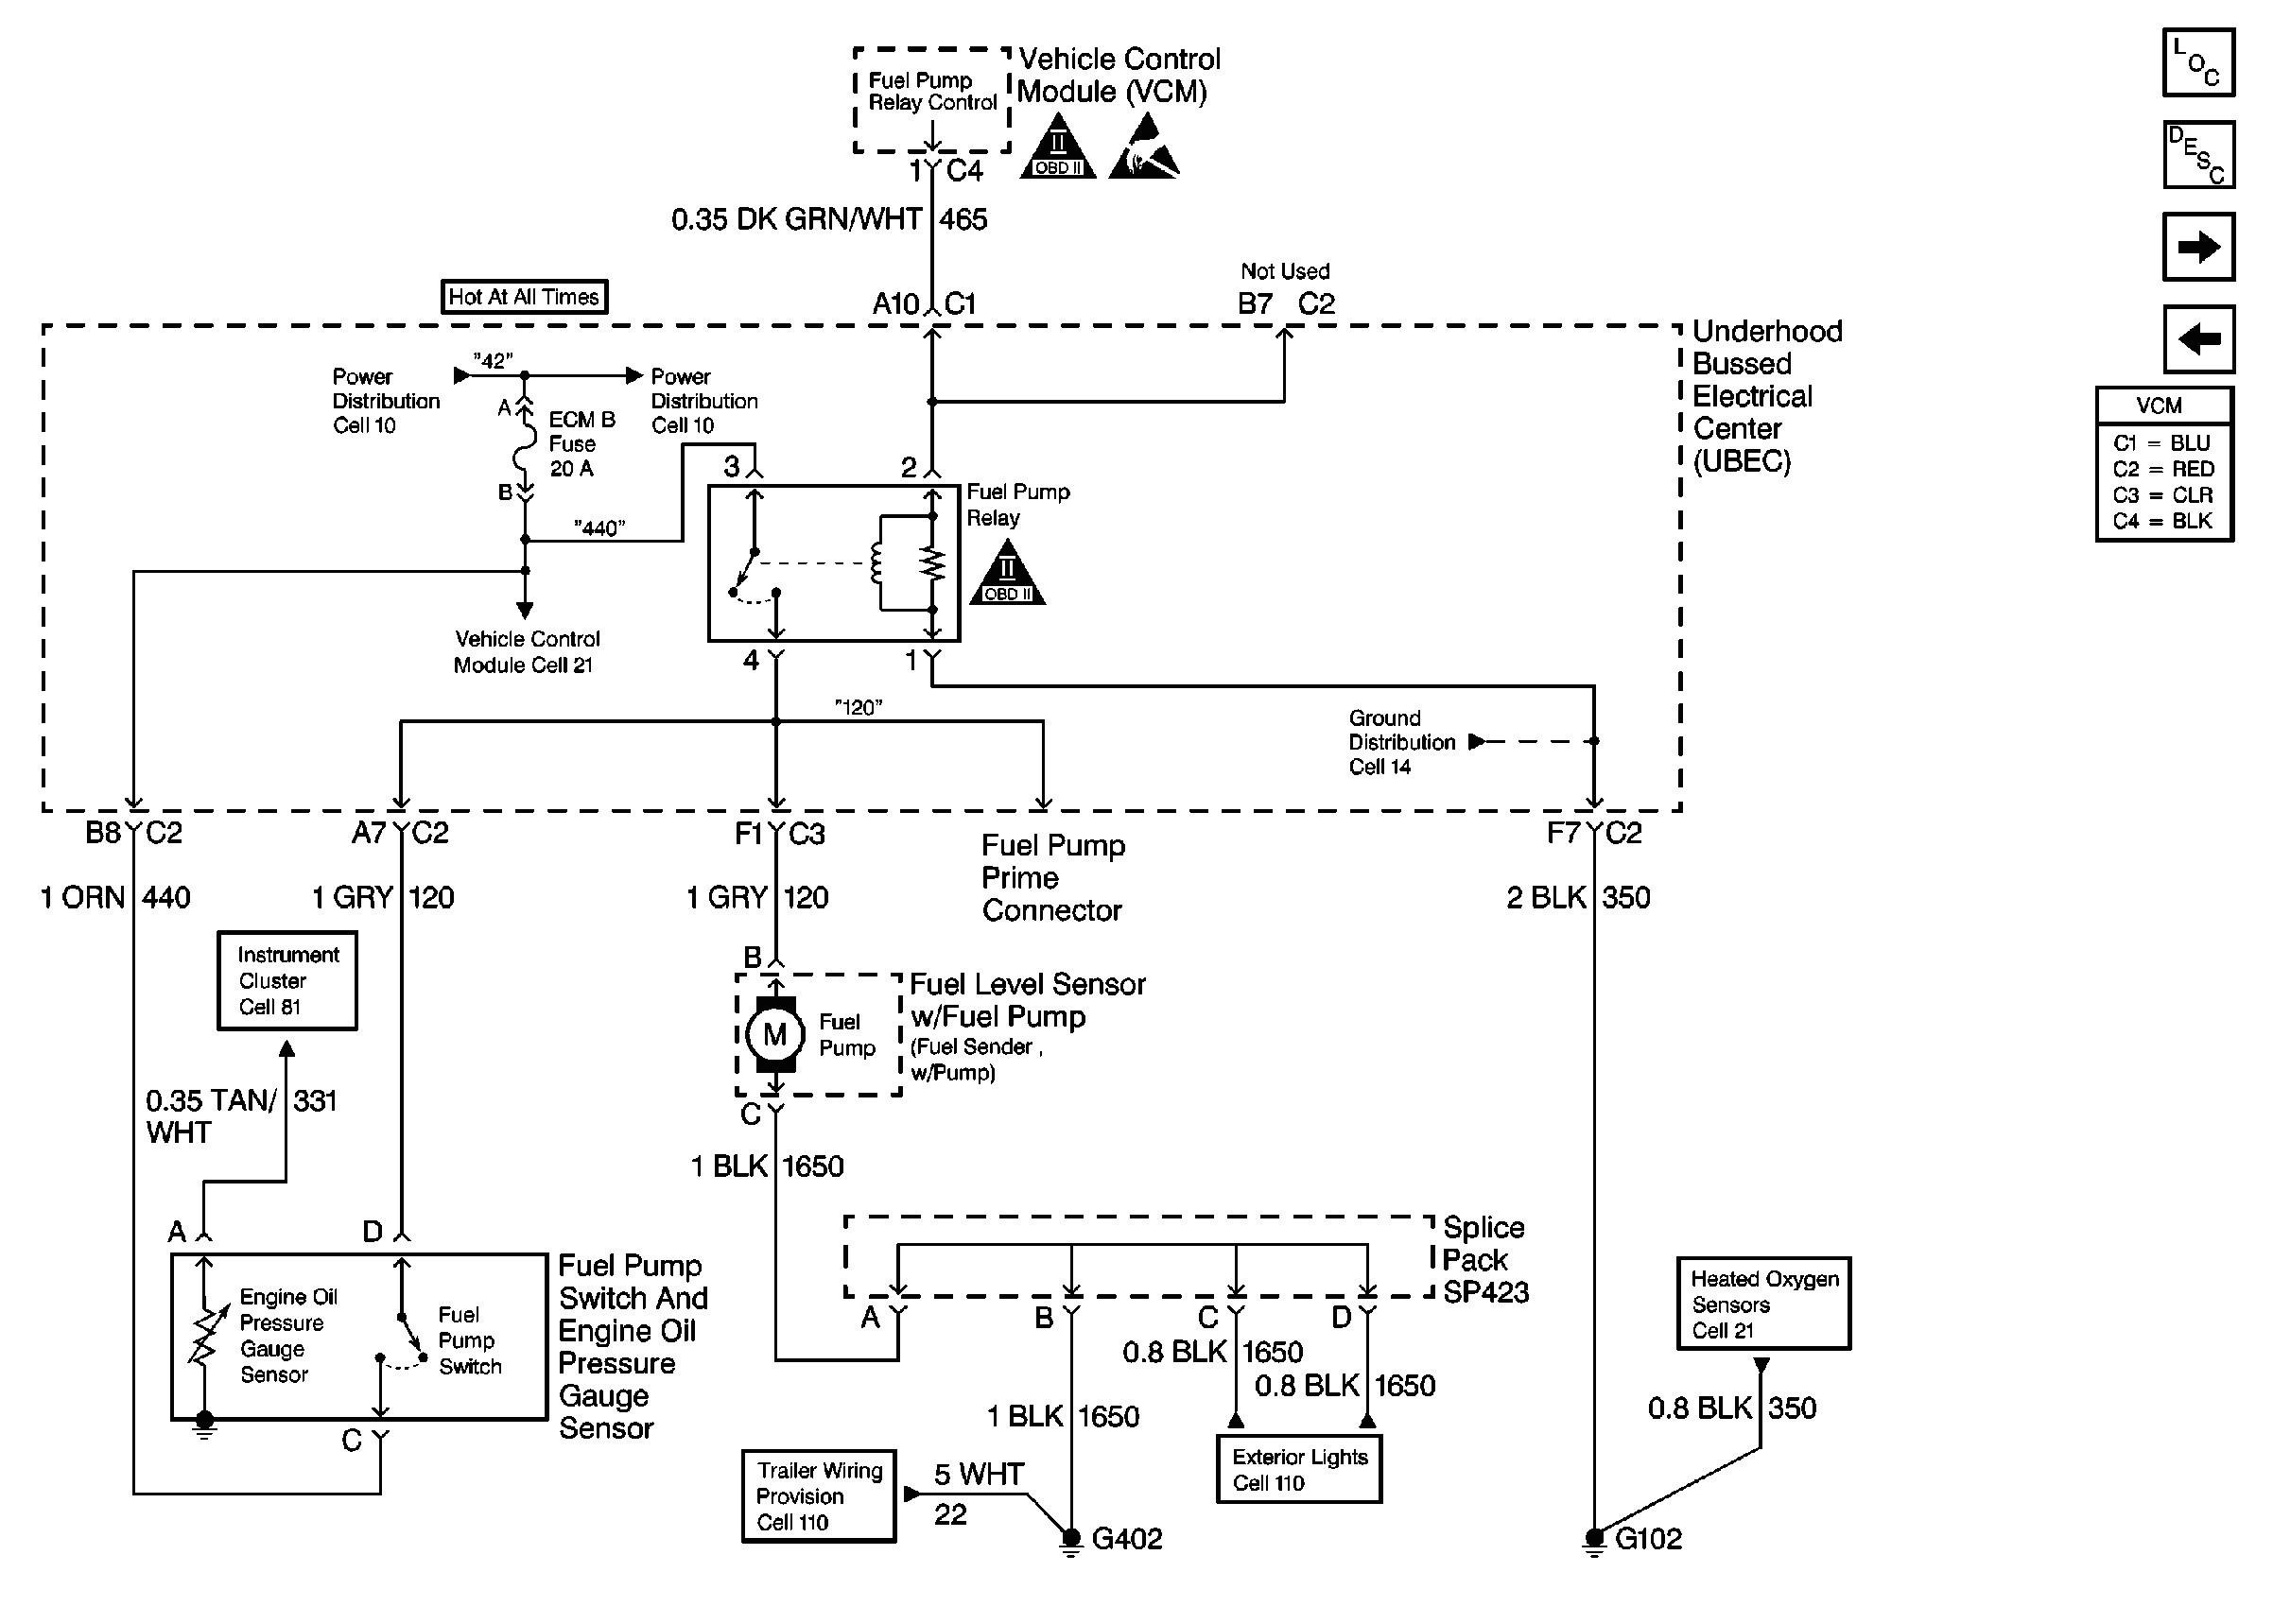 1993 Chevy S10 Wiring Diagram 91 S10 Wiring Diagram Pdf Layout Wiring Diagrams • Of 1993 Chevy S10 Wiring Diagram